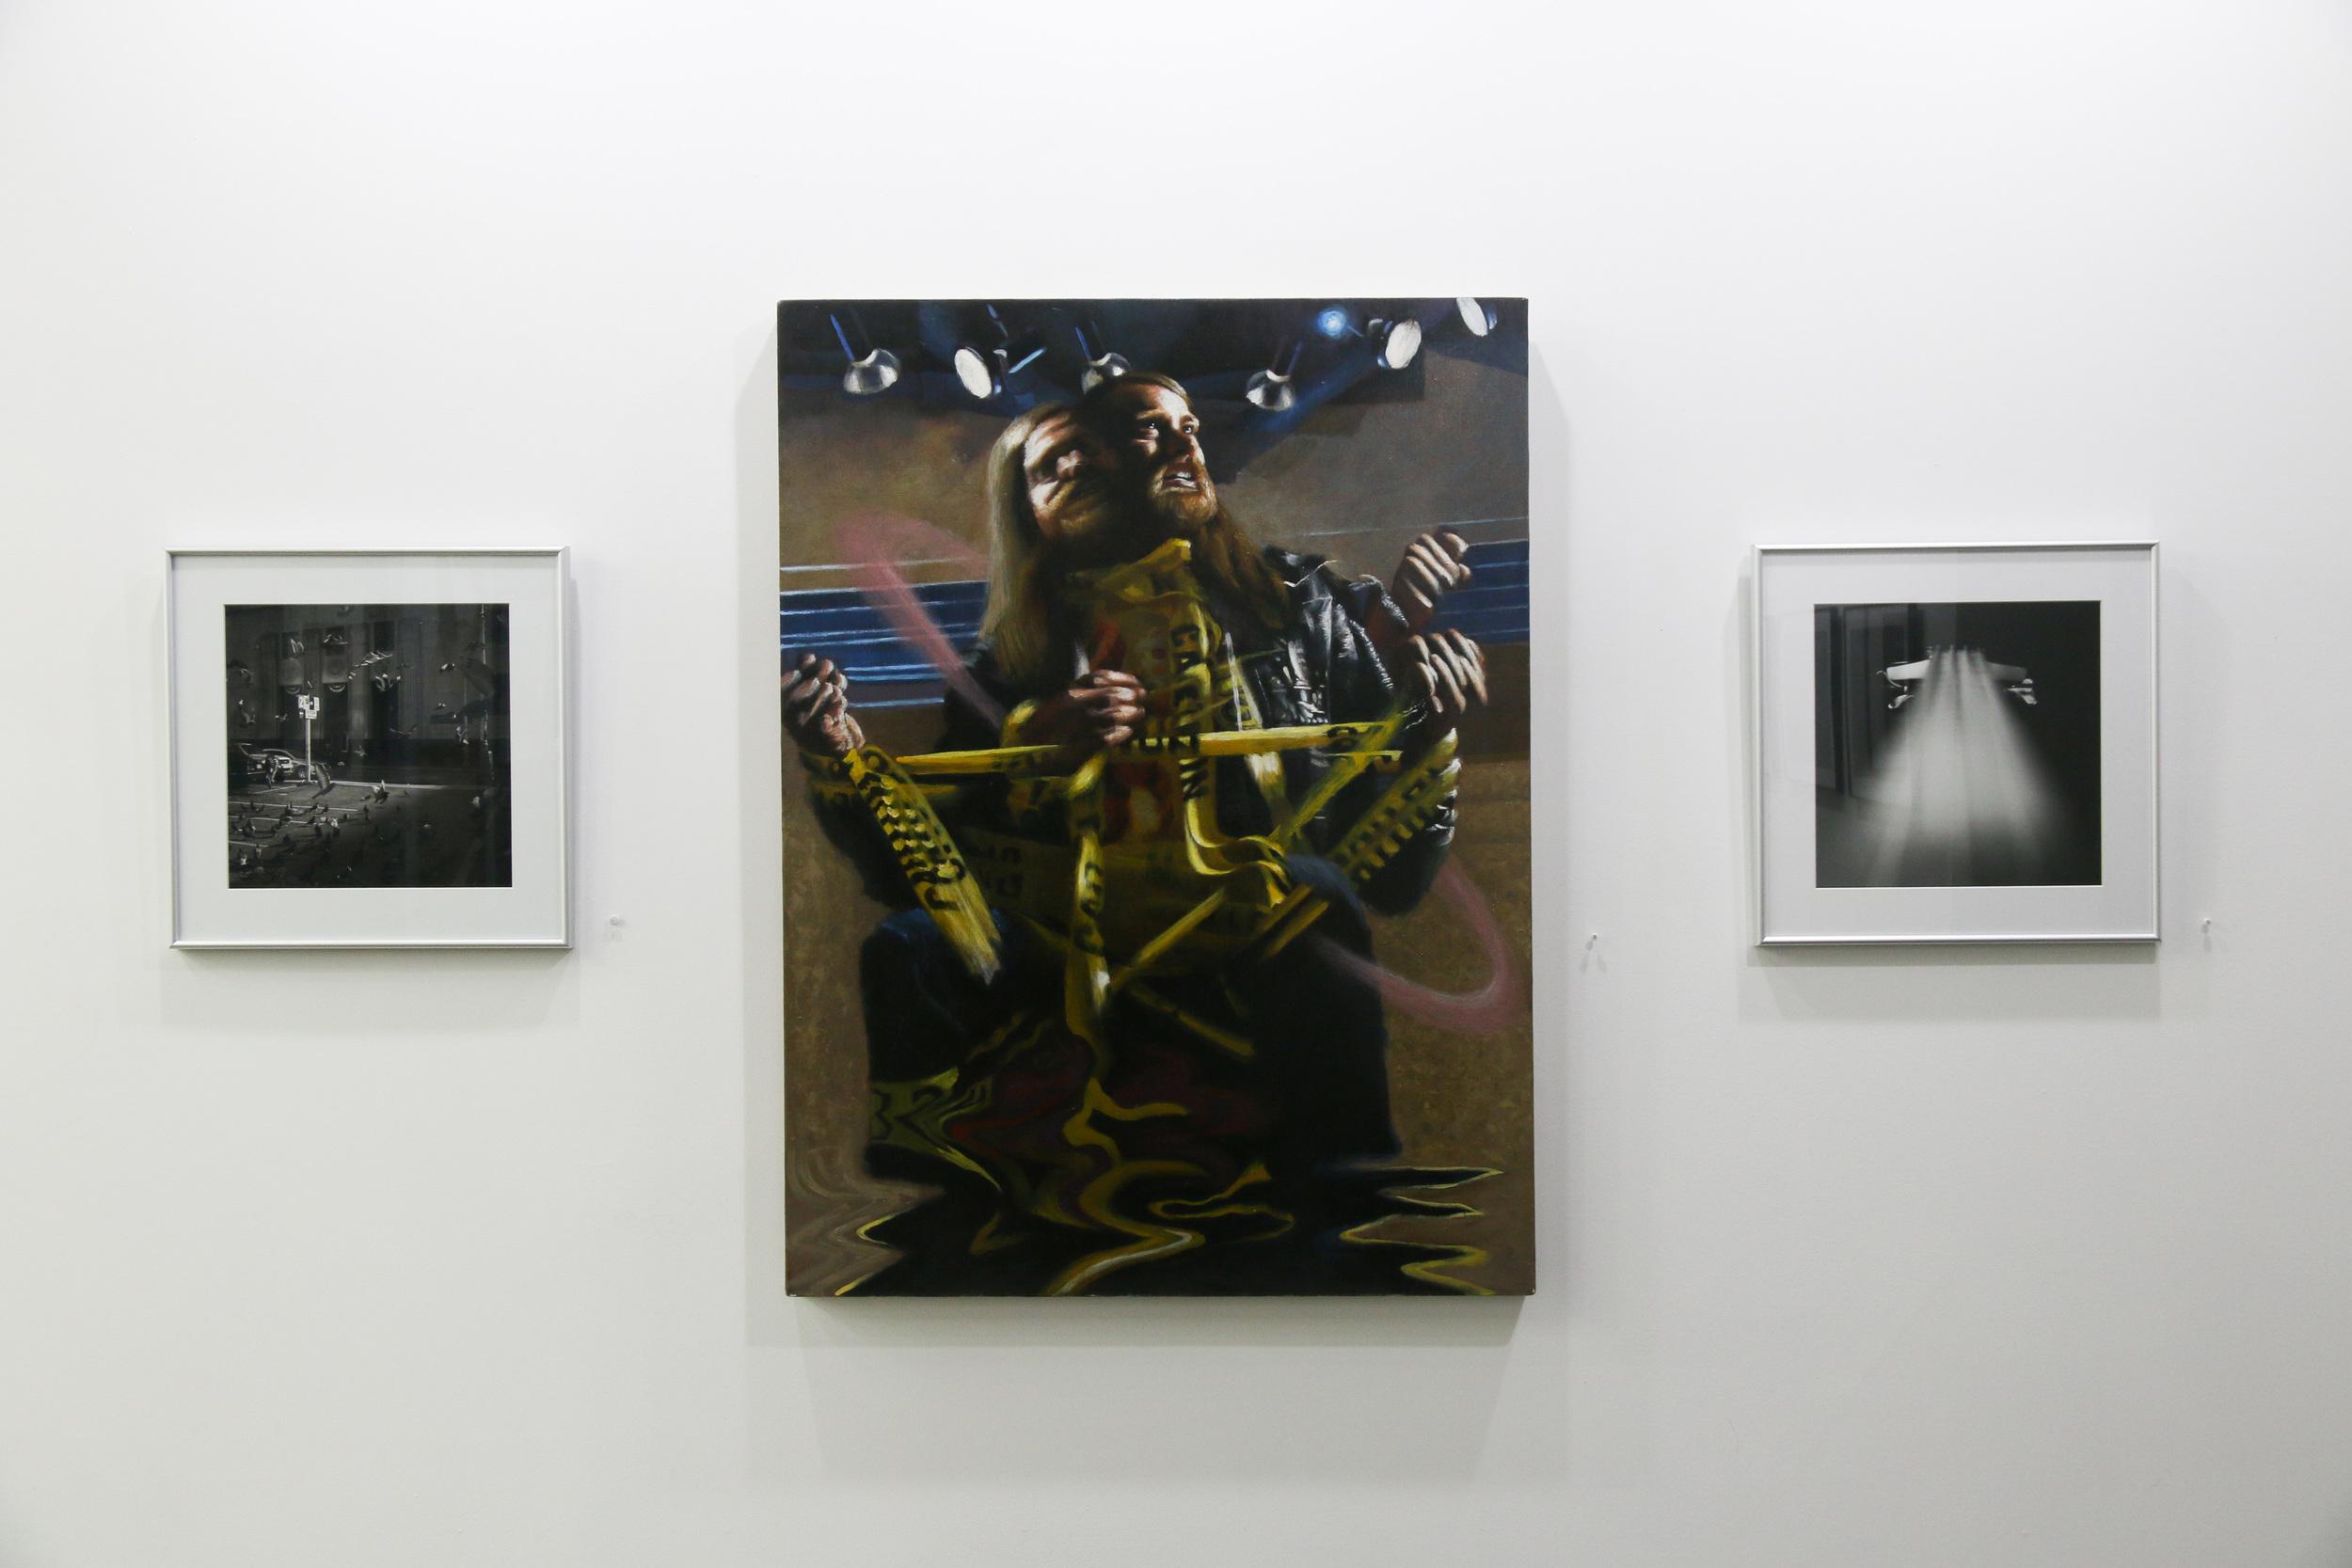 Galerie Camille Install-6.jpg